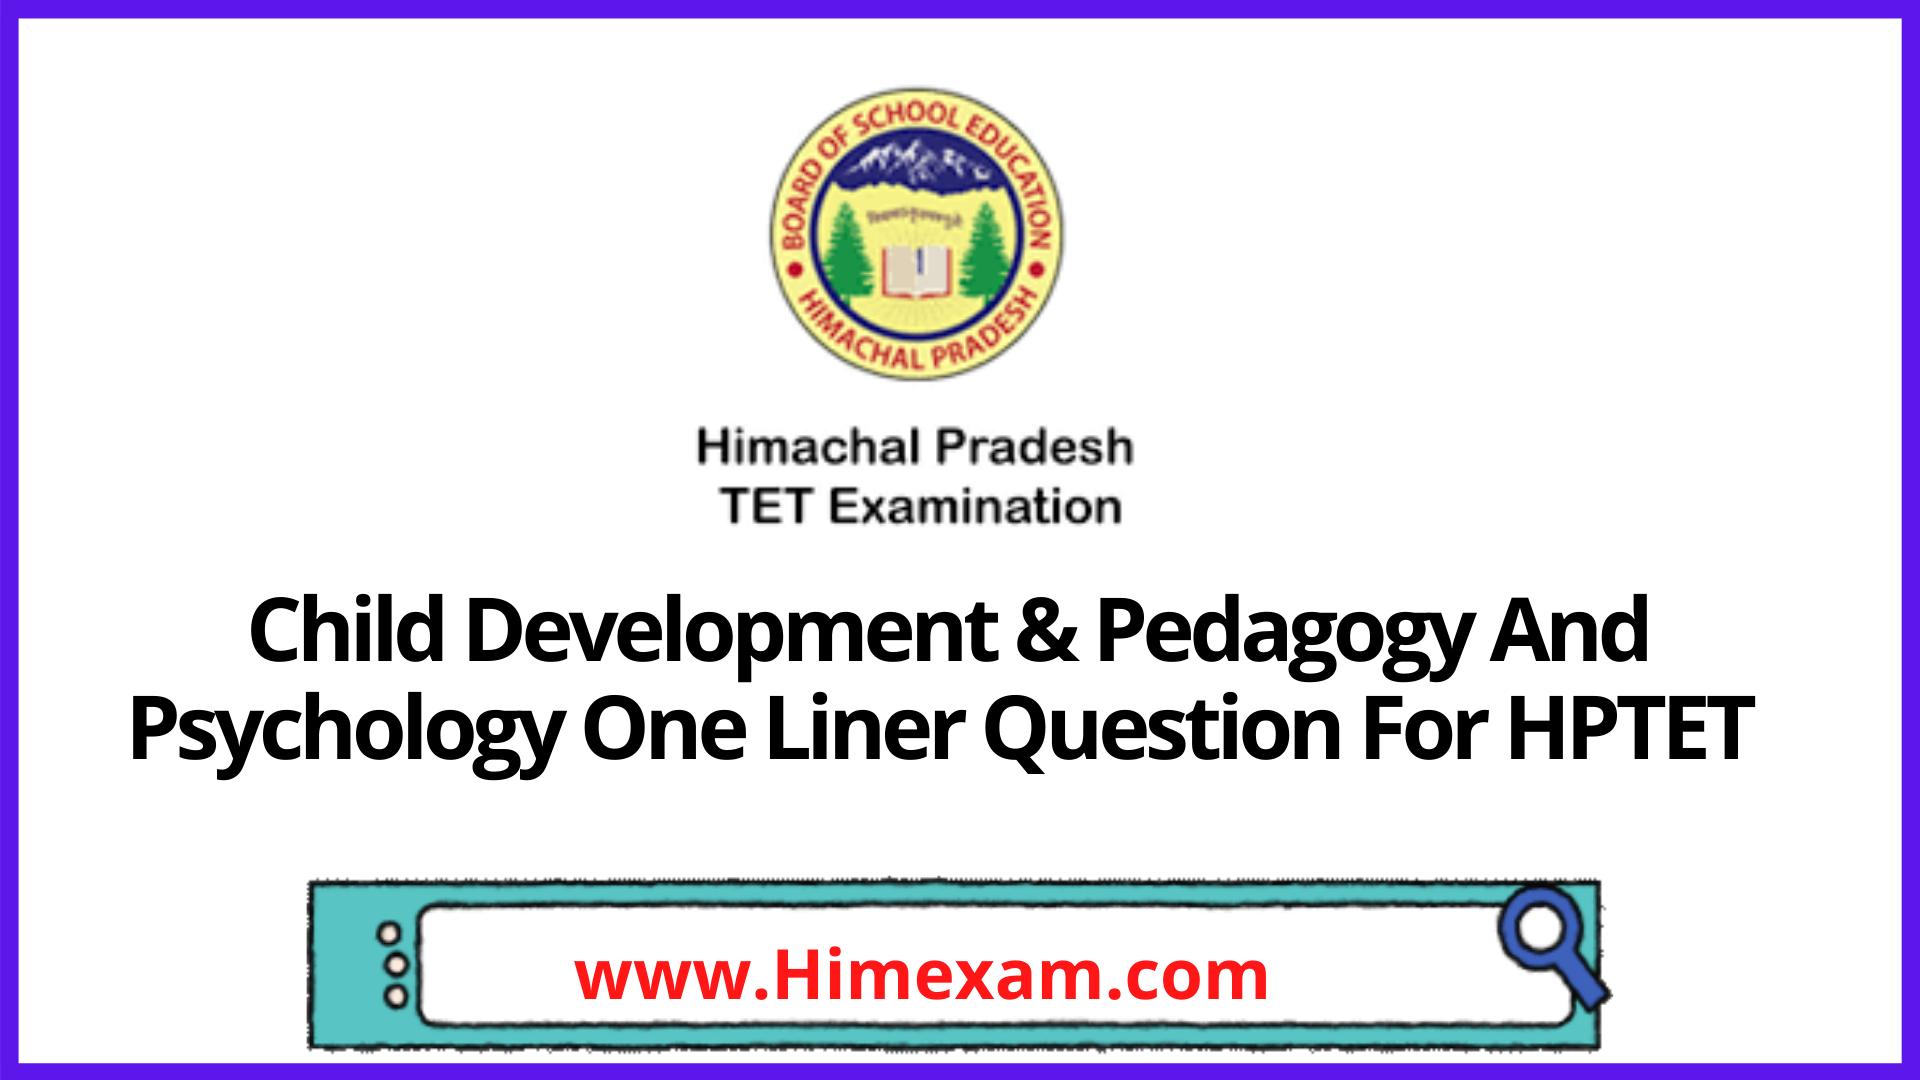 Child Development & Pedagogy And Psychology One Liner Question For HPTET